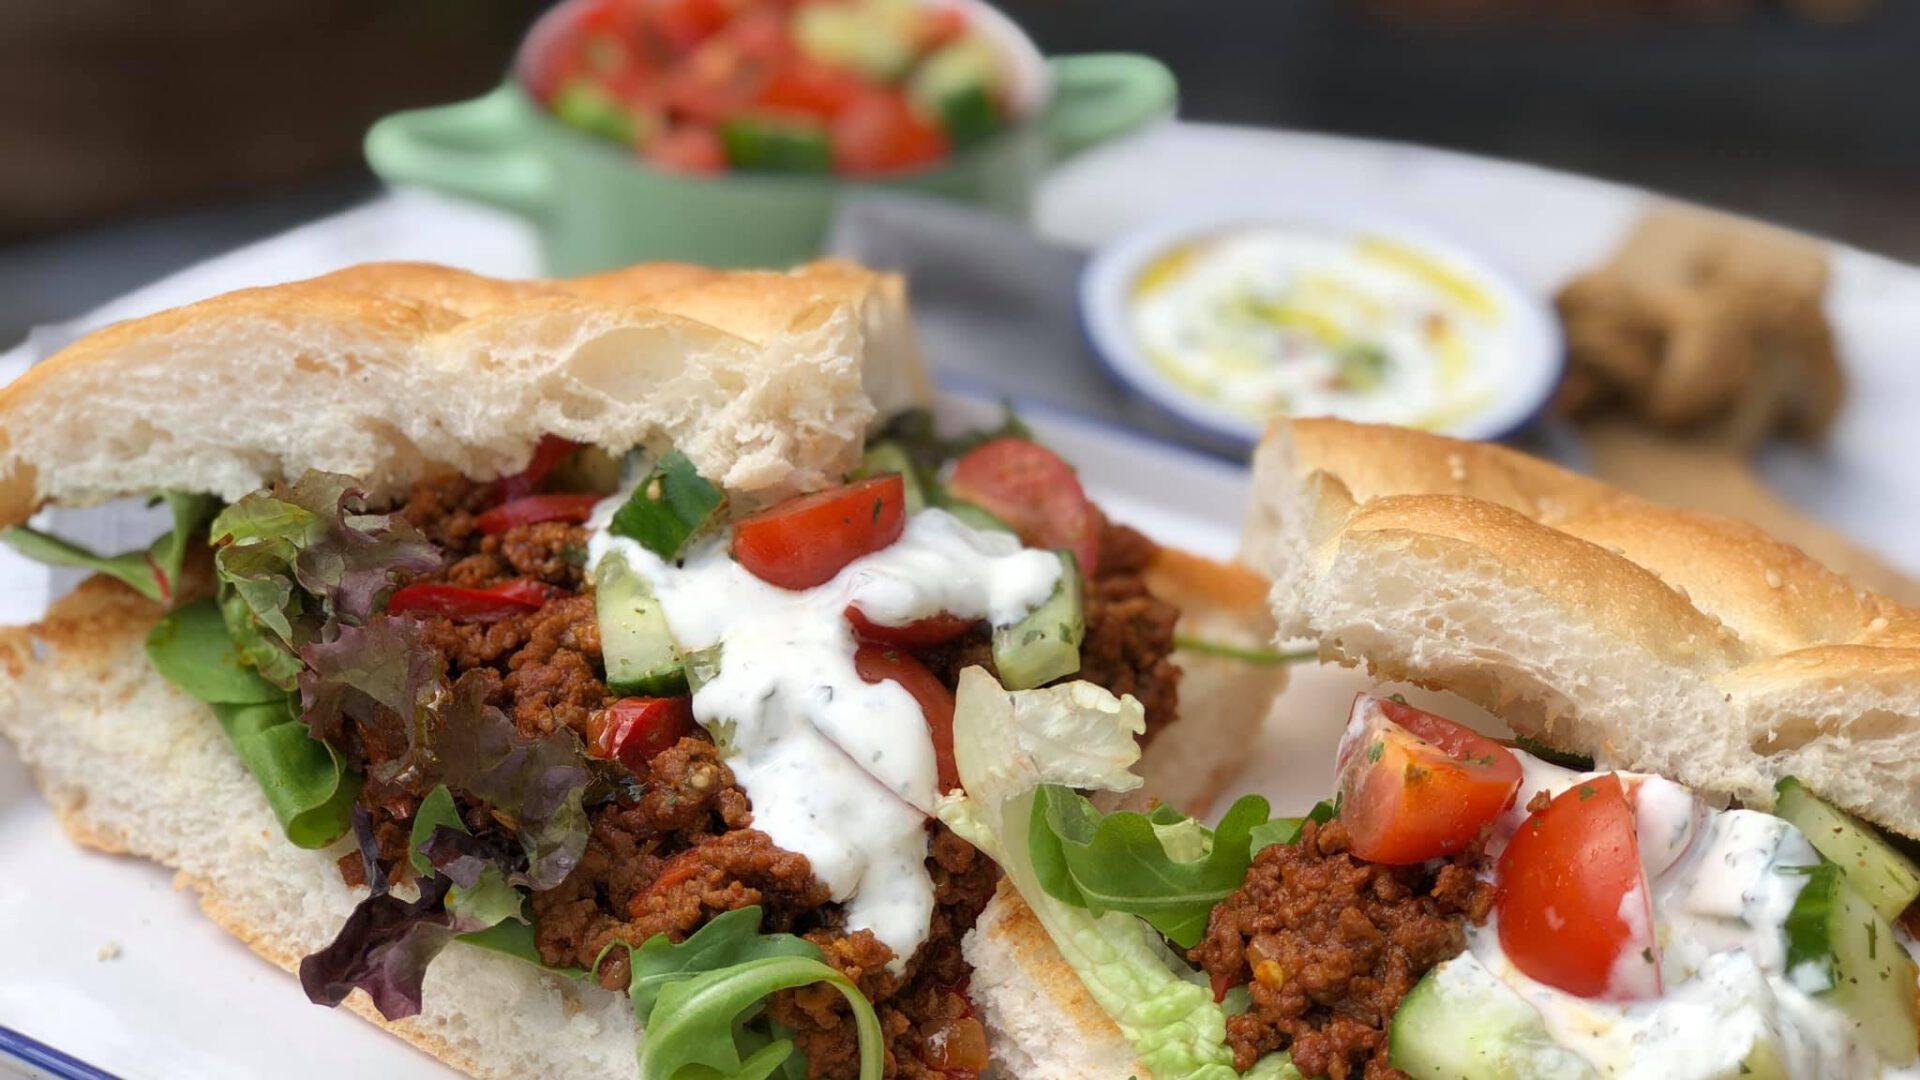 Turks brood met kruidig gehakt, salsa en yoghurtdip